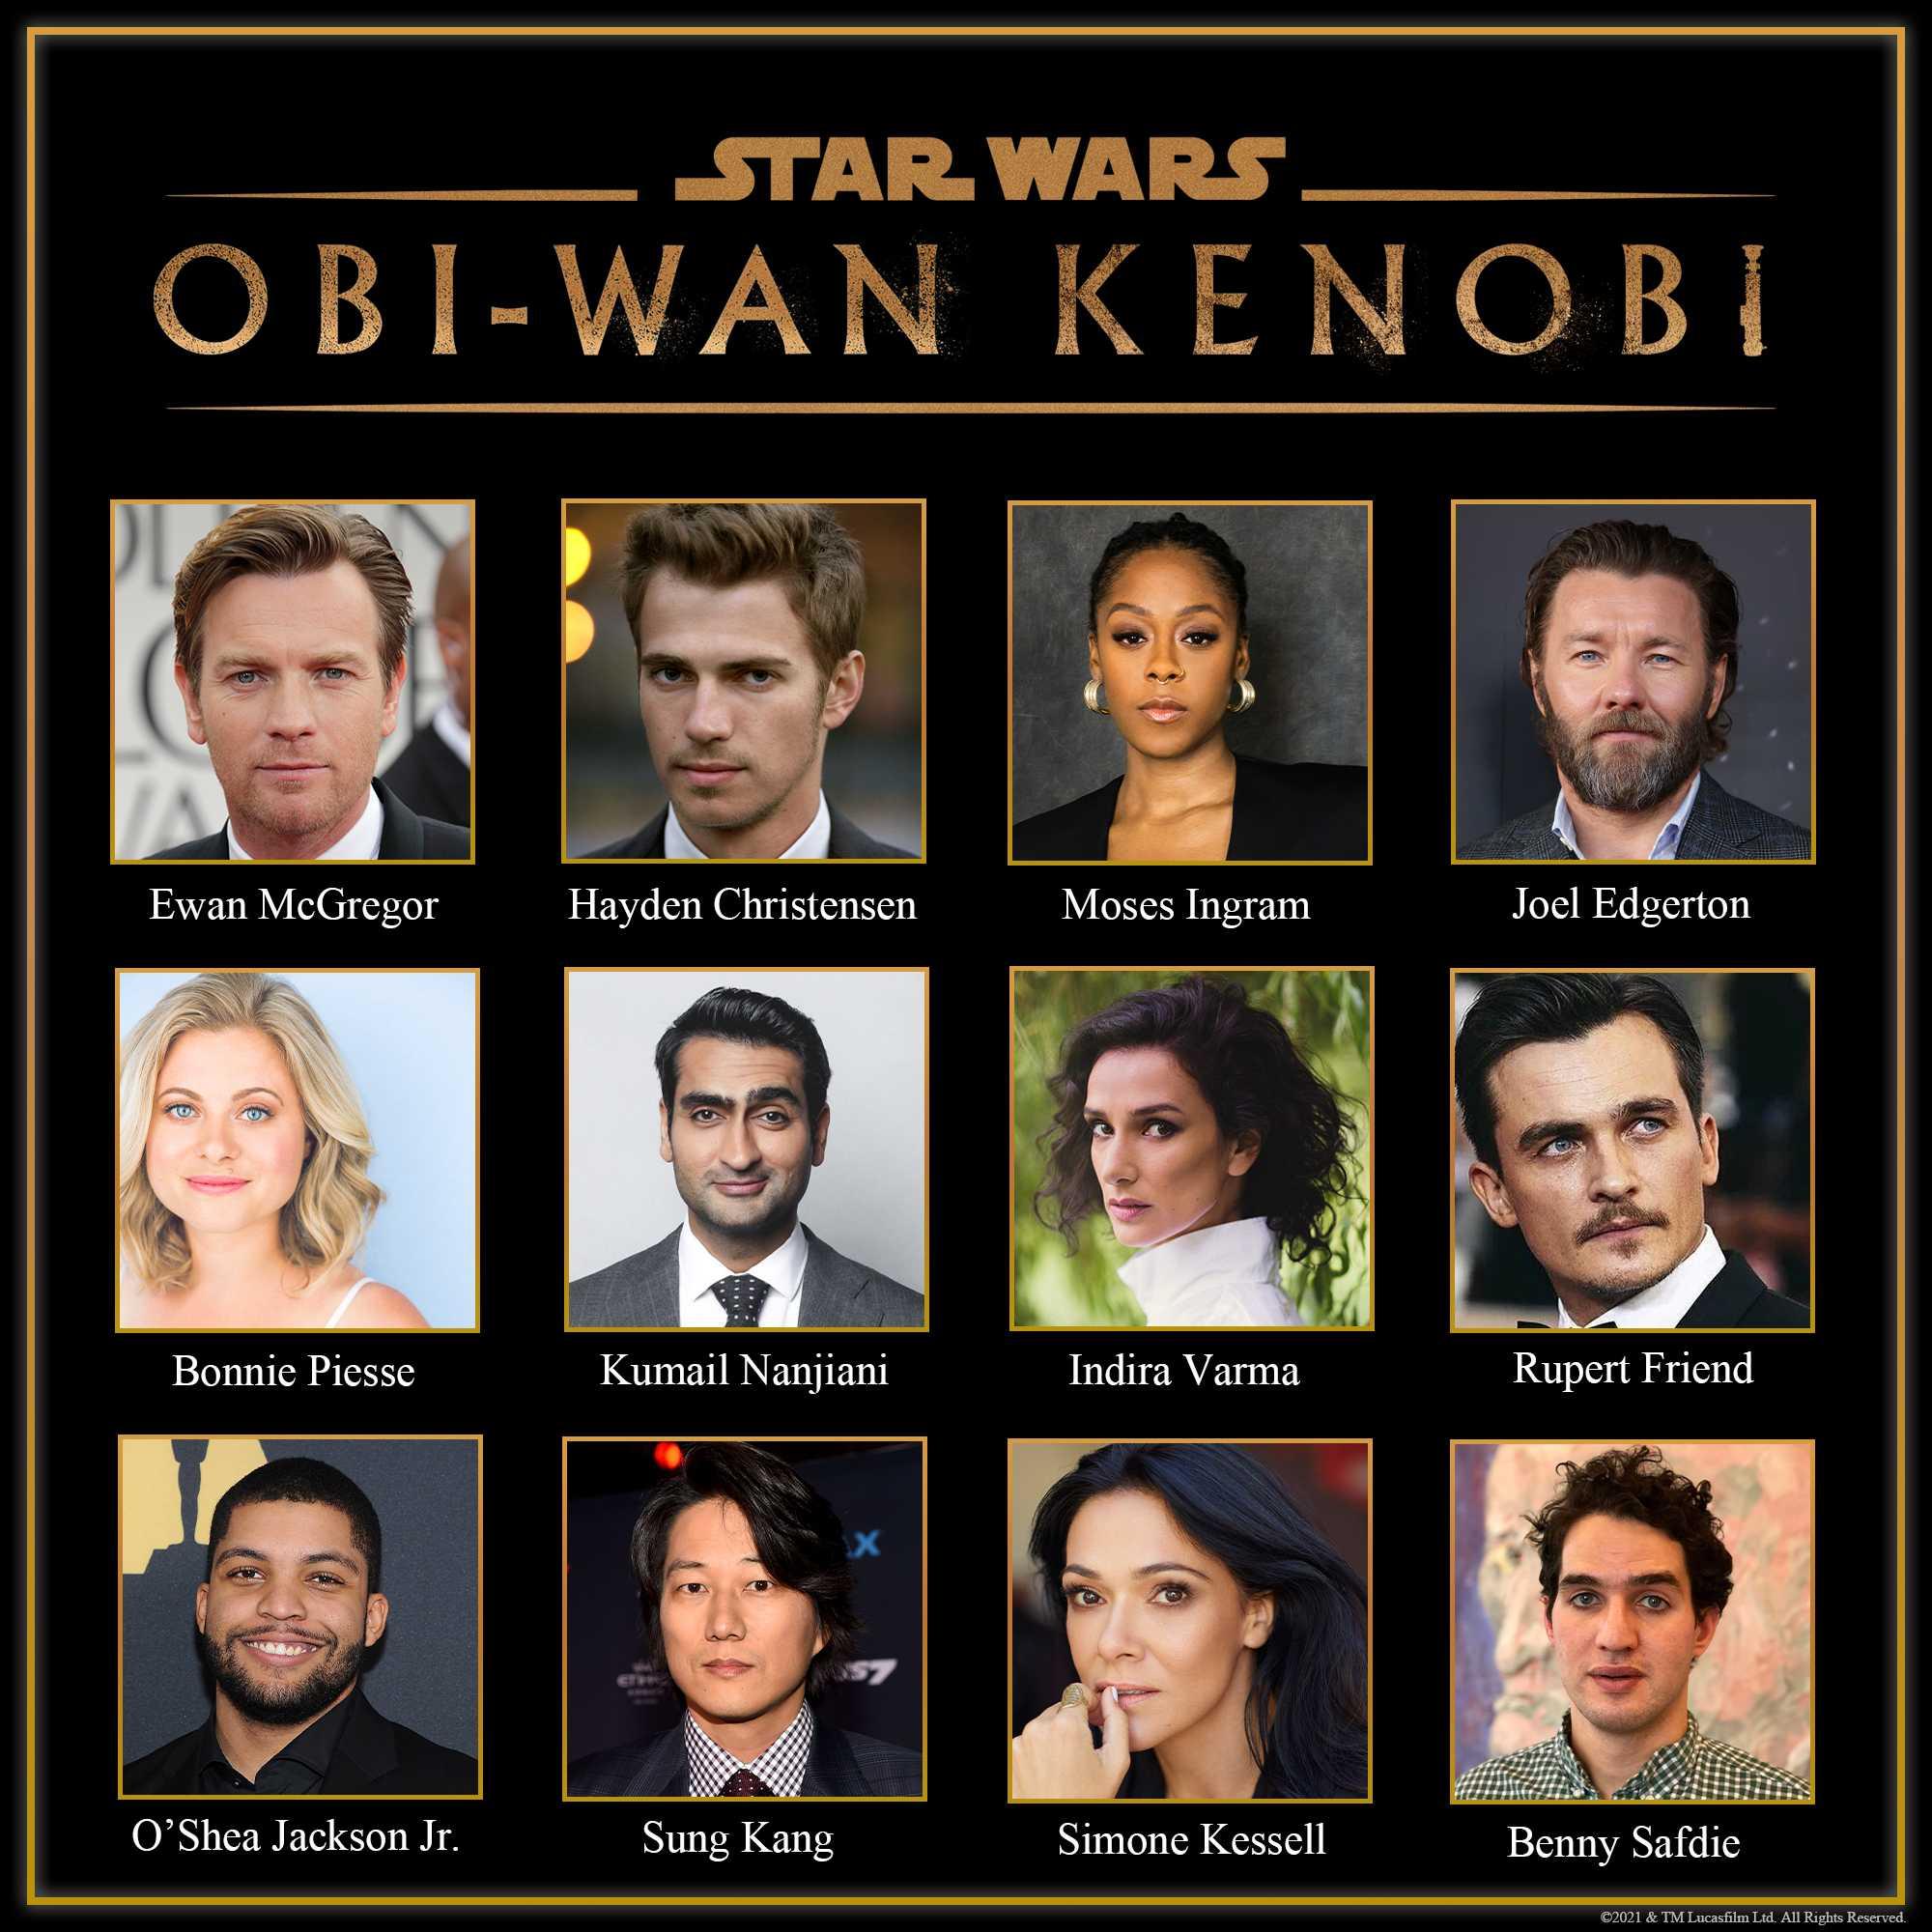 elenco obi-wan